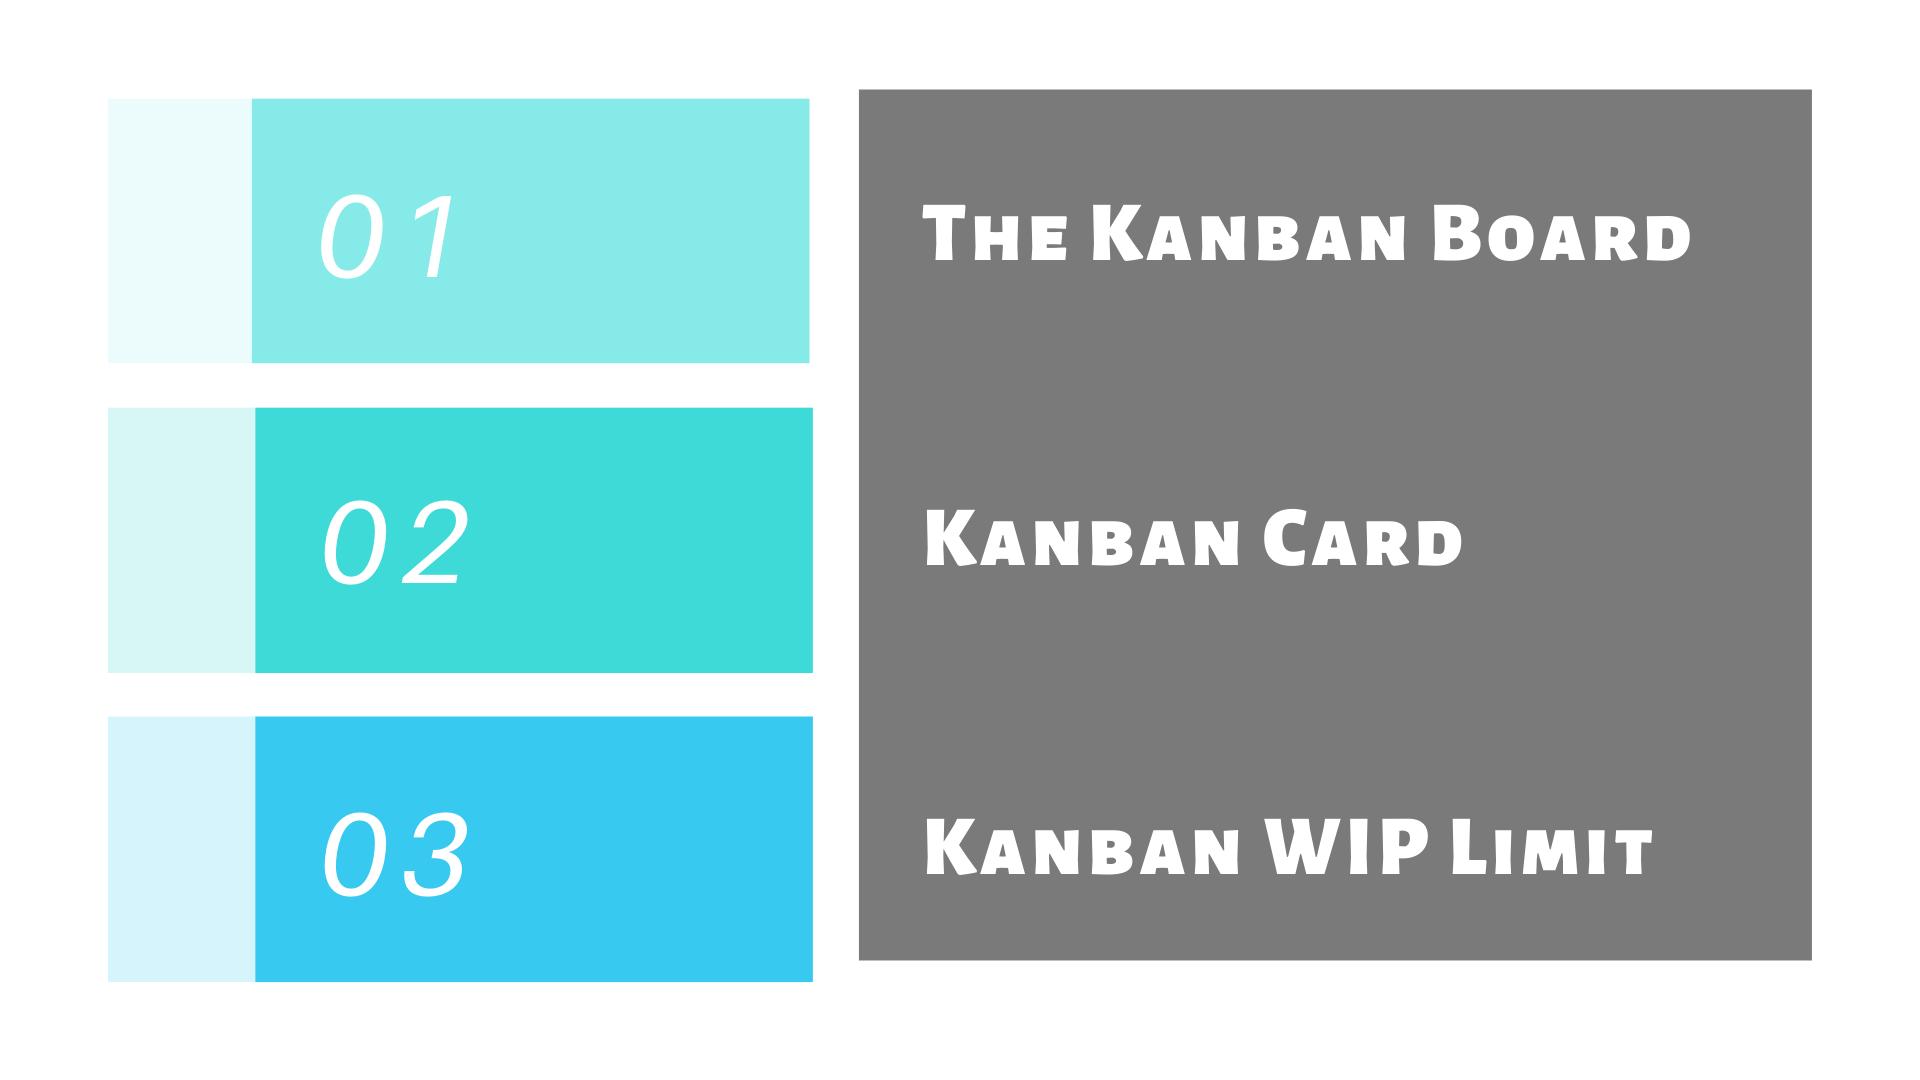 Components of Kanban